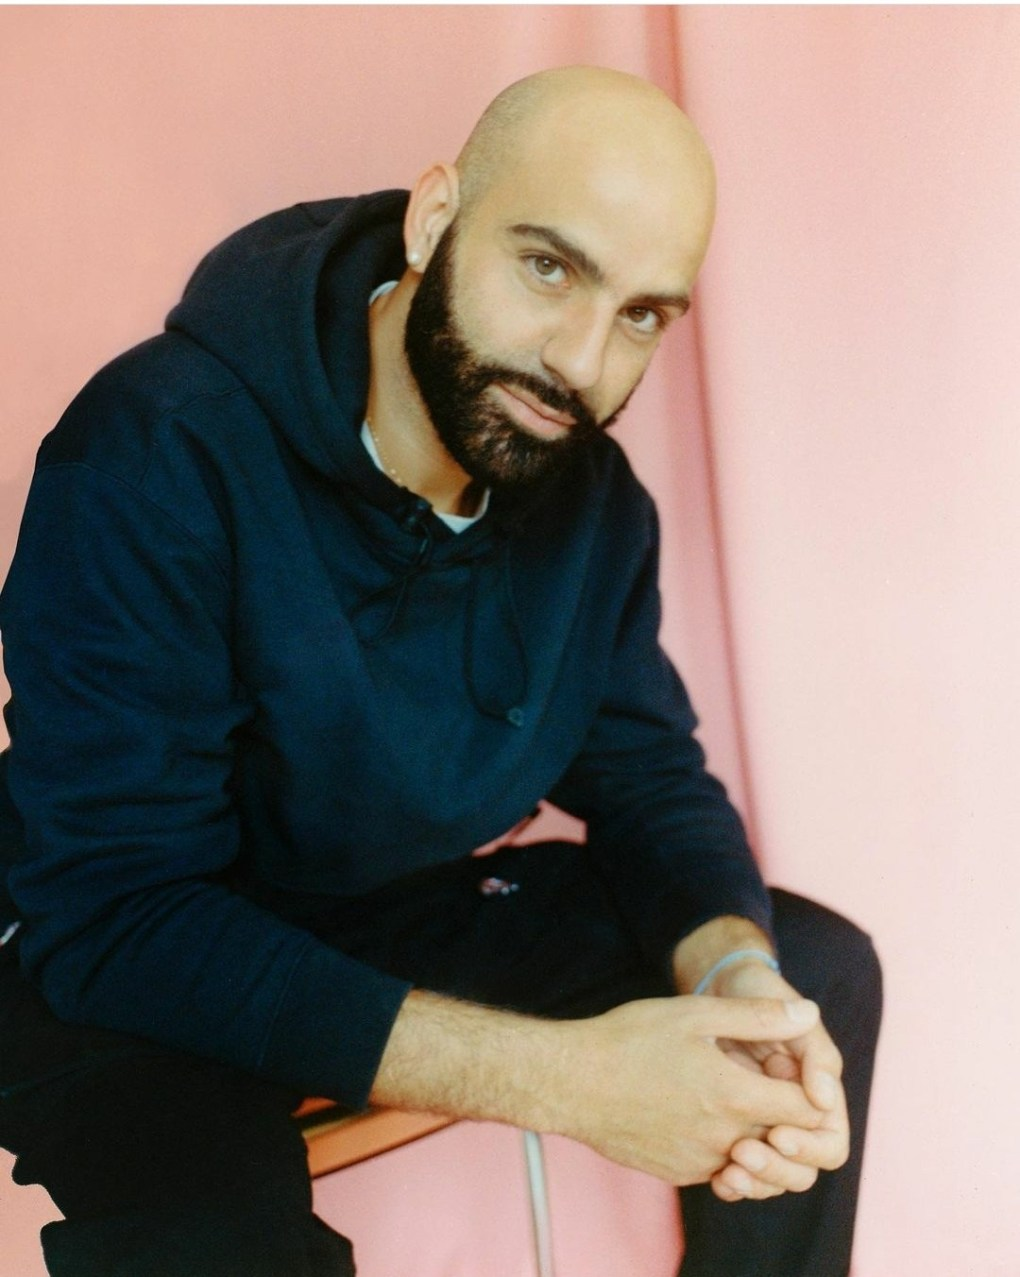 Vegan shoe designer Alfredo Piferi